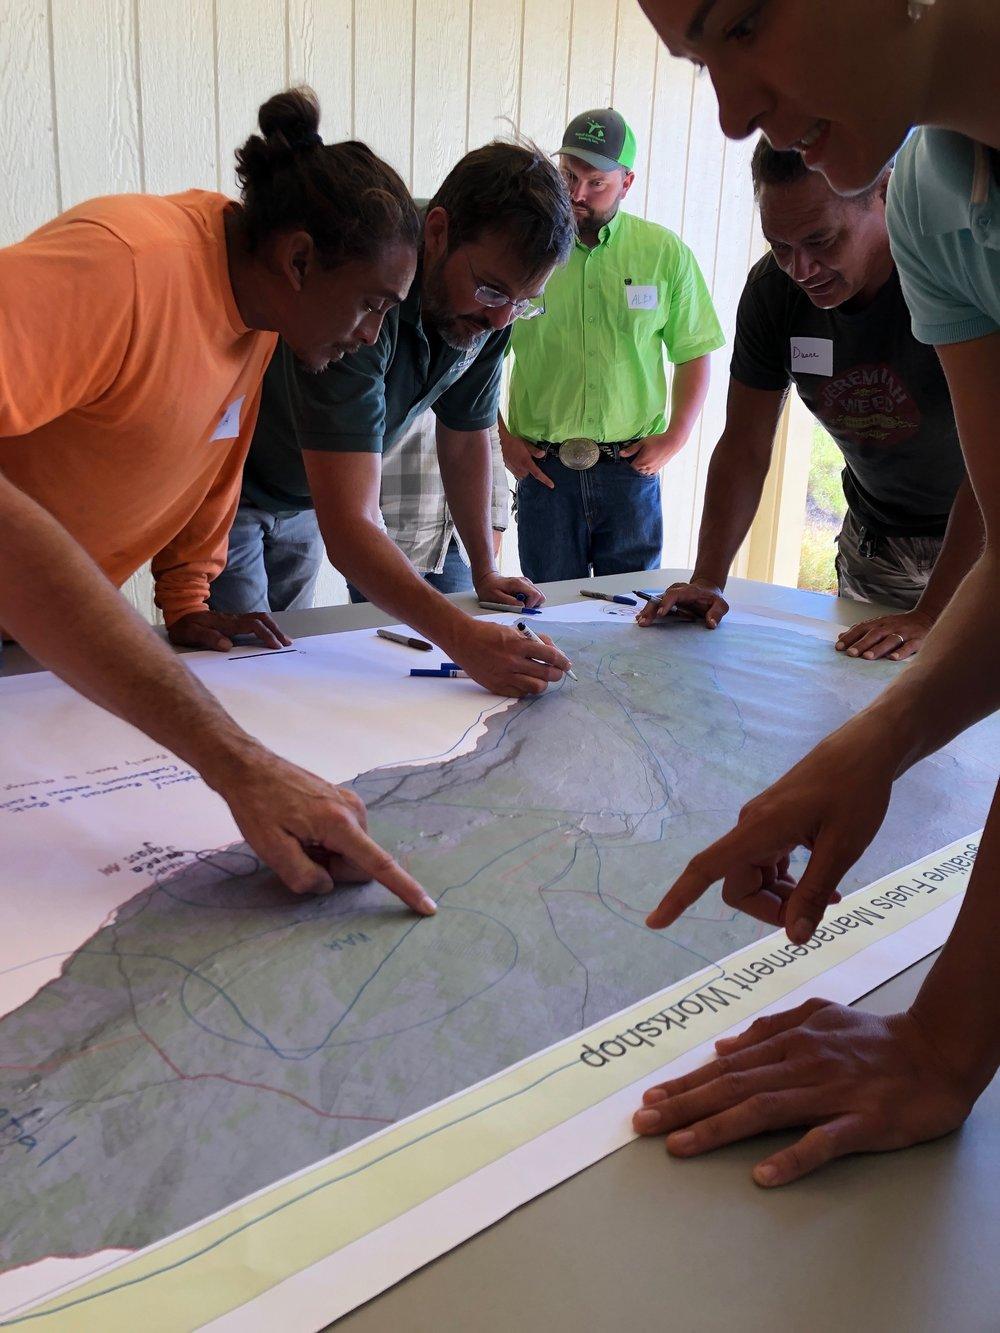 Hawaii Island Kailapa Vegetative Fuels Management Collaborative Action Planning Workshop_2_26_2019_38.jpg